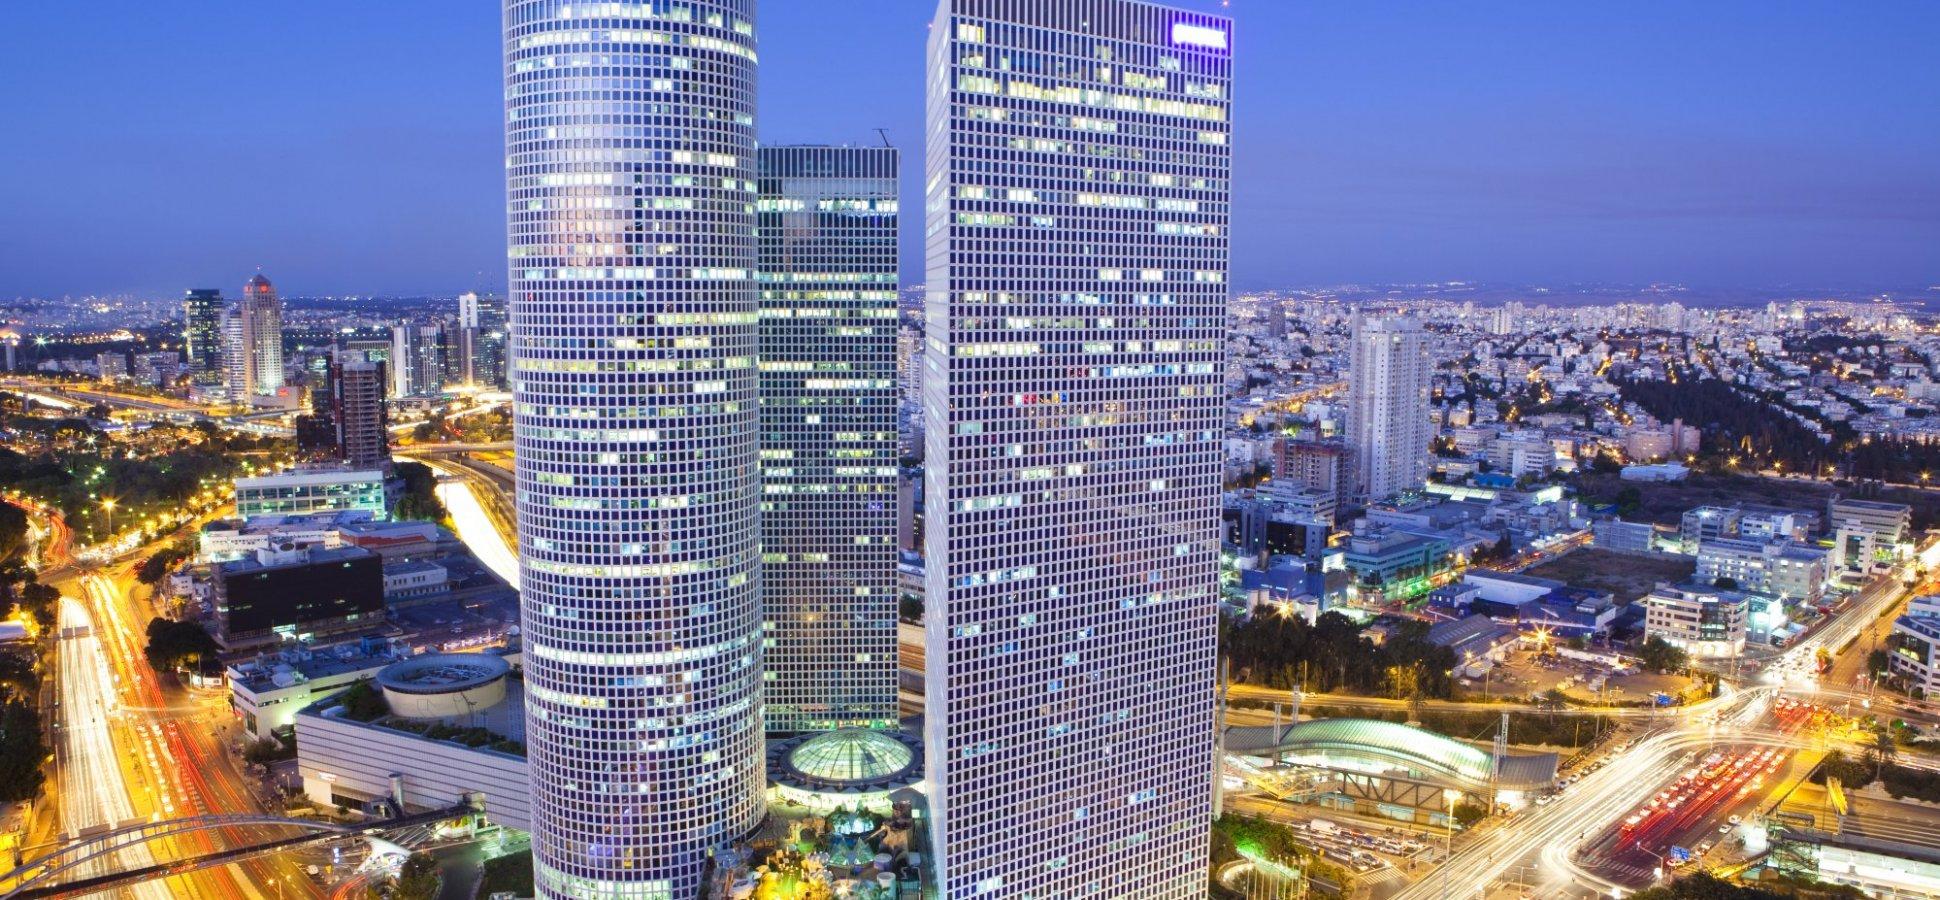 7 Mindsets I Learned From Israeli Entrepreneurs That Changed How I Do Business